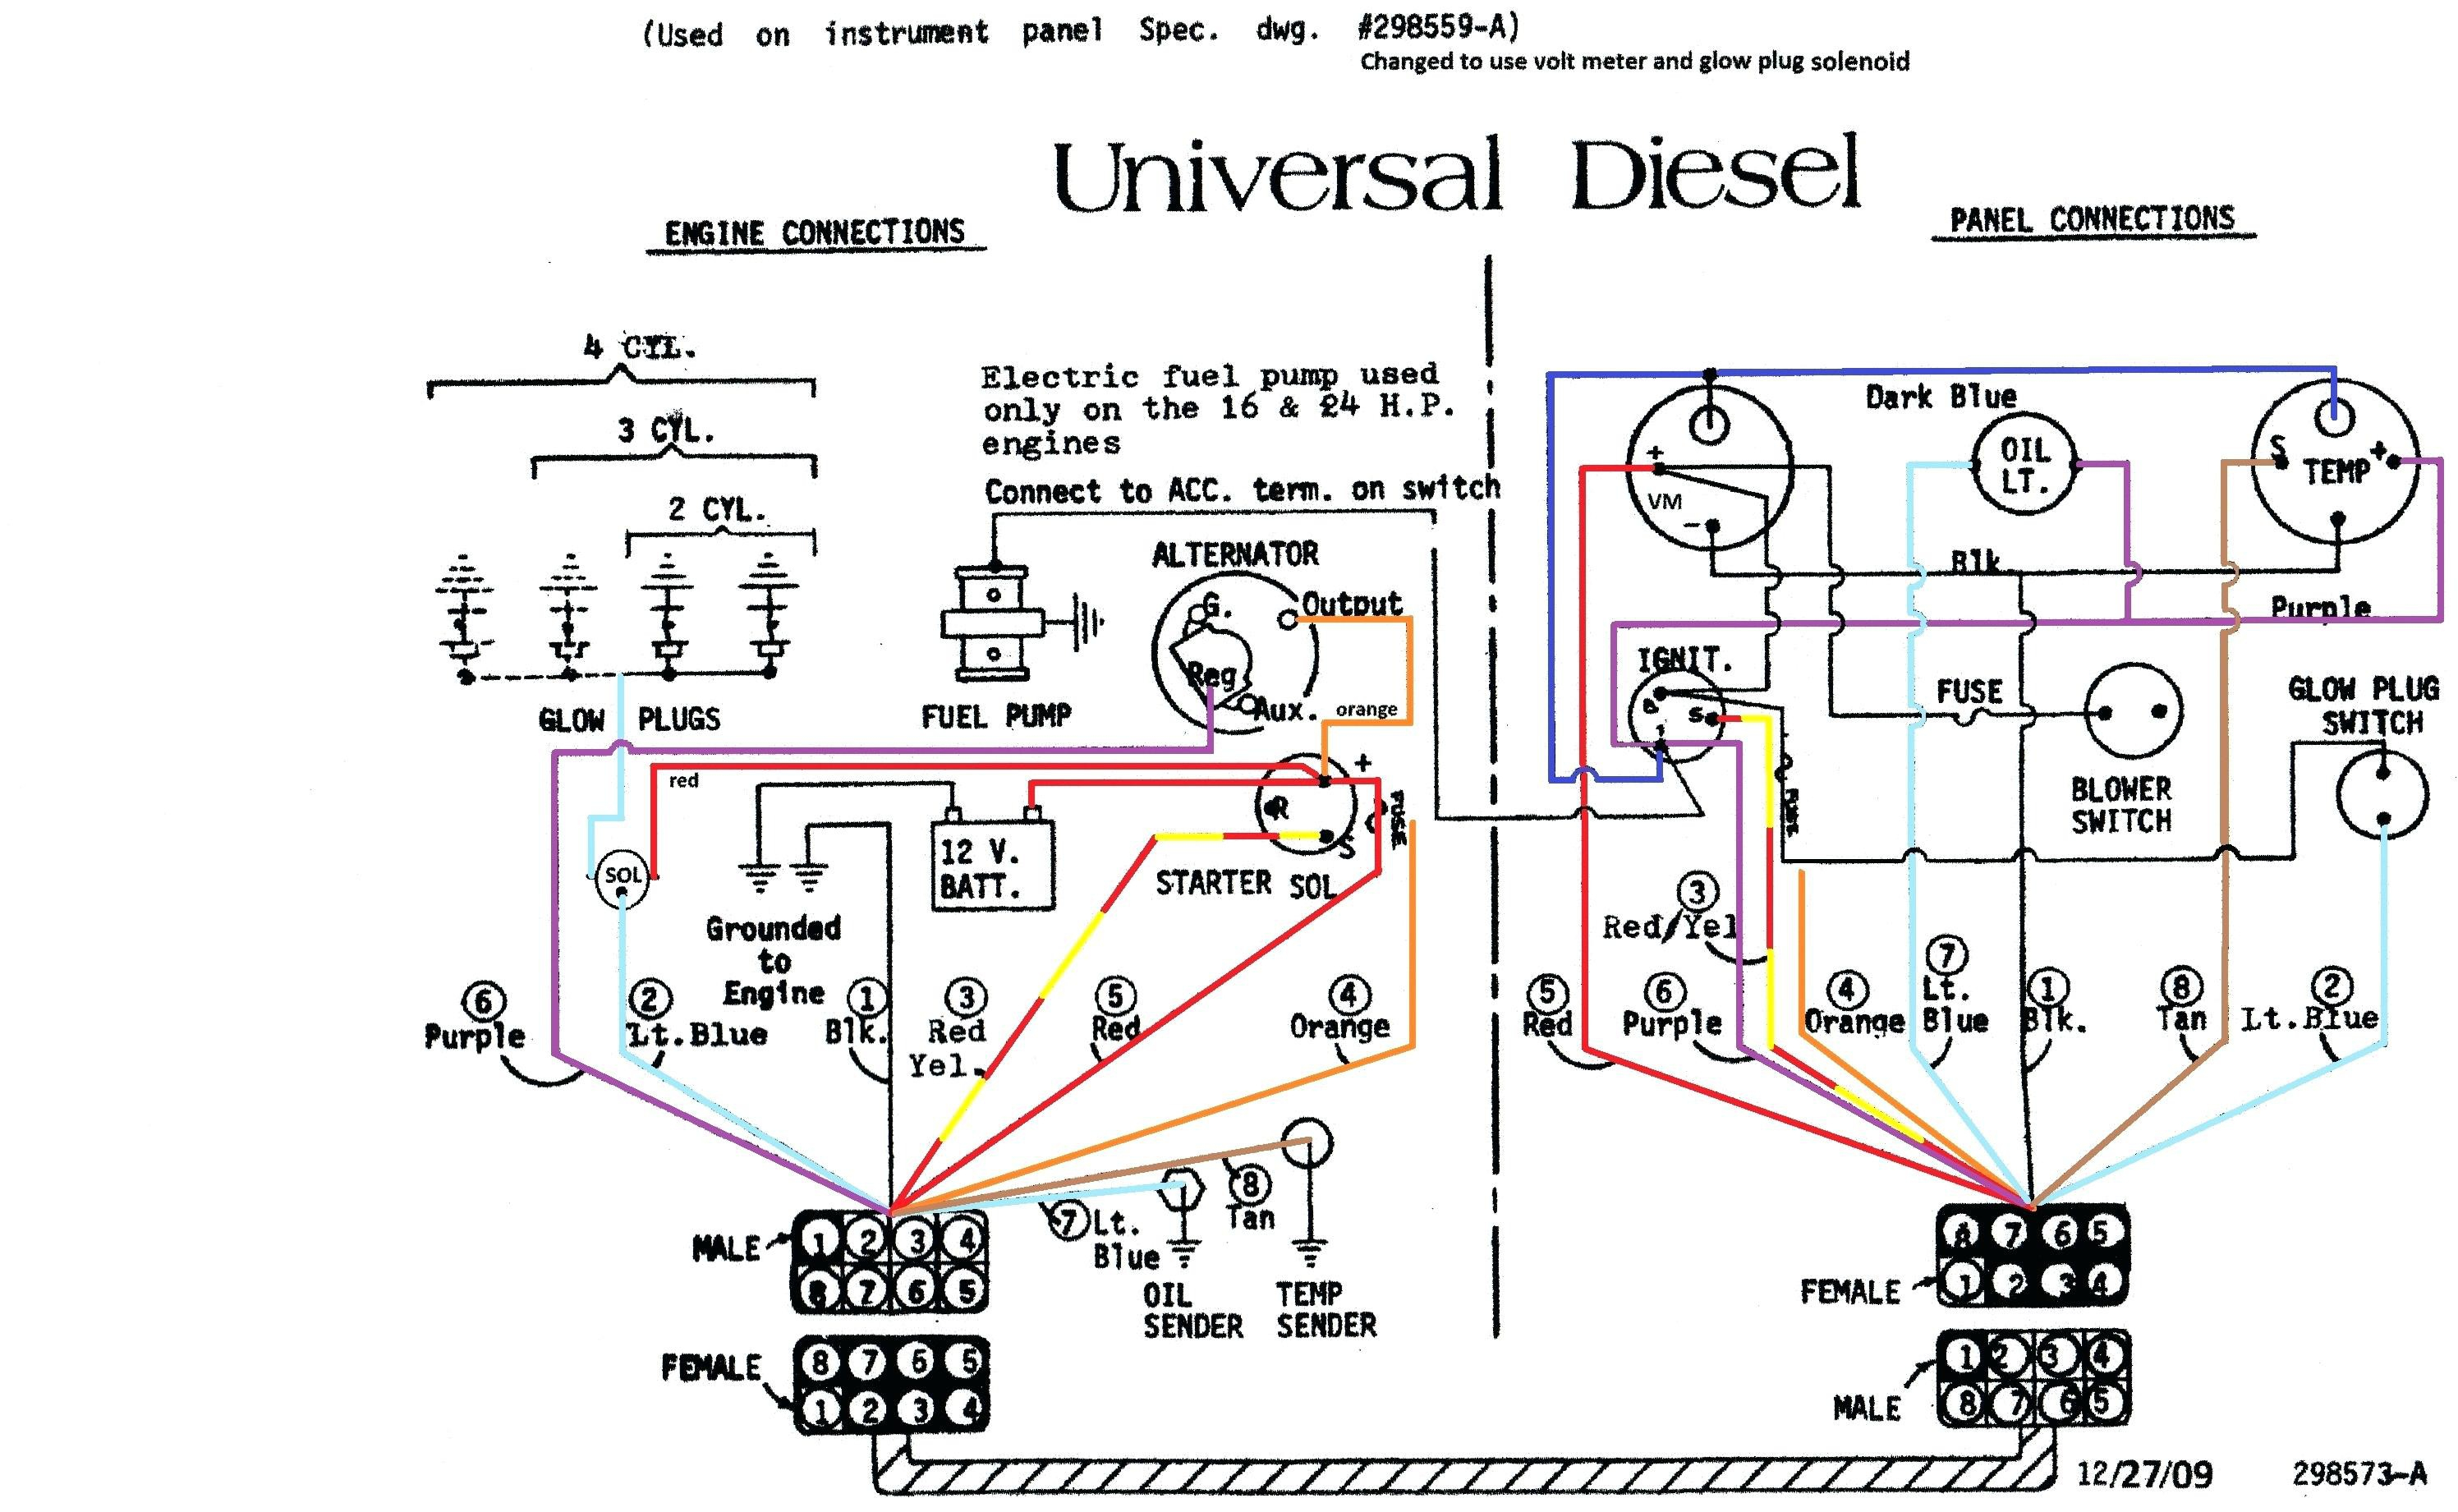 trailer plug diagram, 7 prong trailer jack, 7-wire rv wiring diagram, 7 prong rv wiring, 7 pin trailer diagram, rv plug wiring diagram, 7-wire trailer diagram, 7 pronge trailer connector diagram, on 7 prong trailer wiring diagram dodge